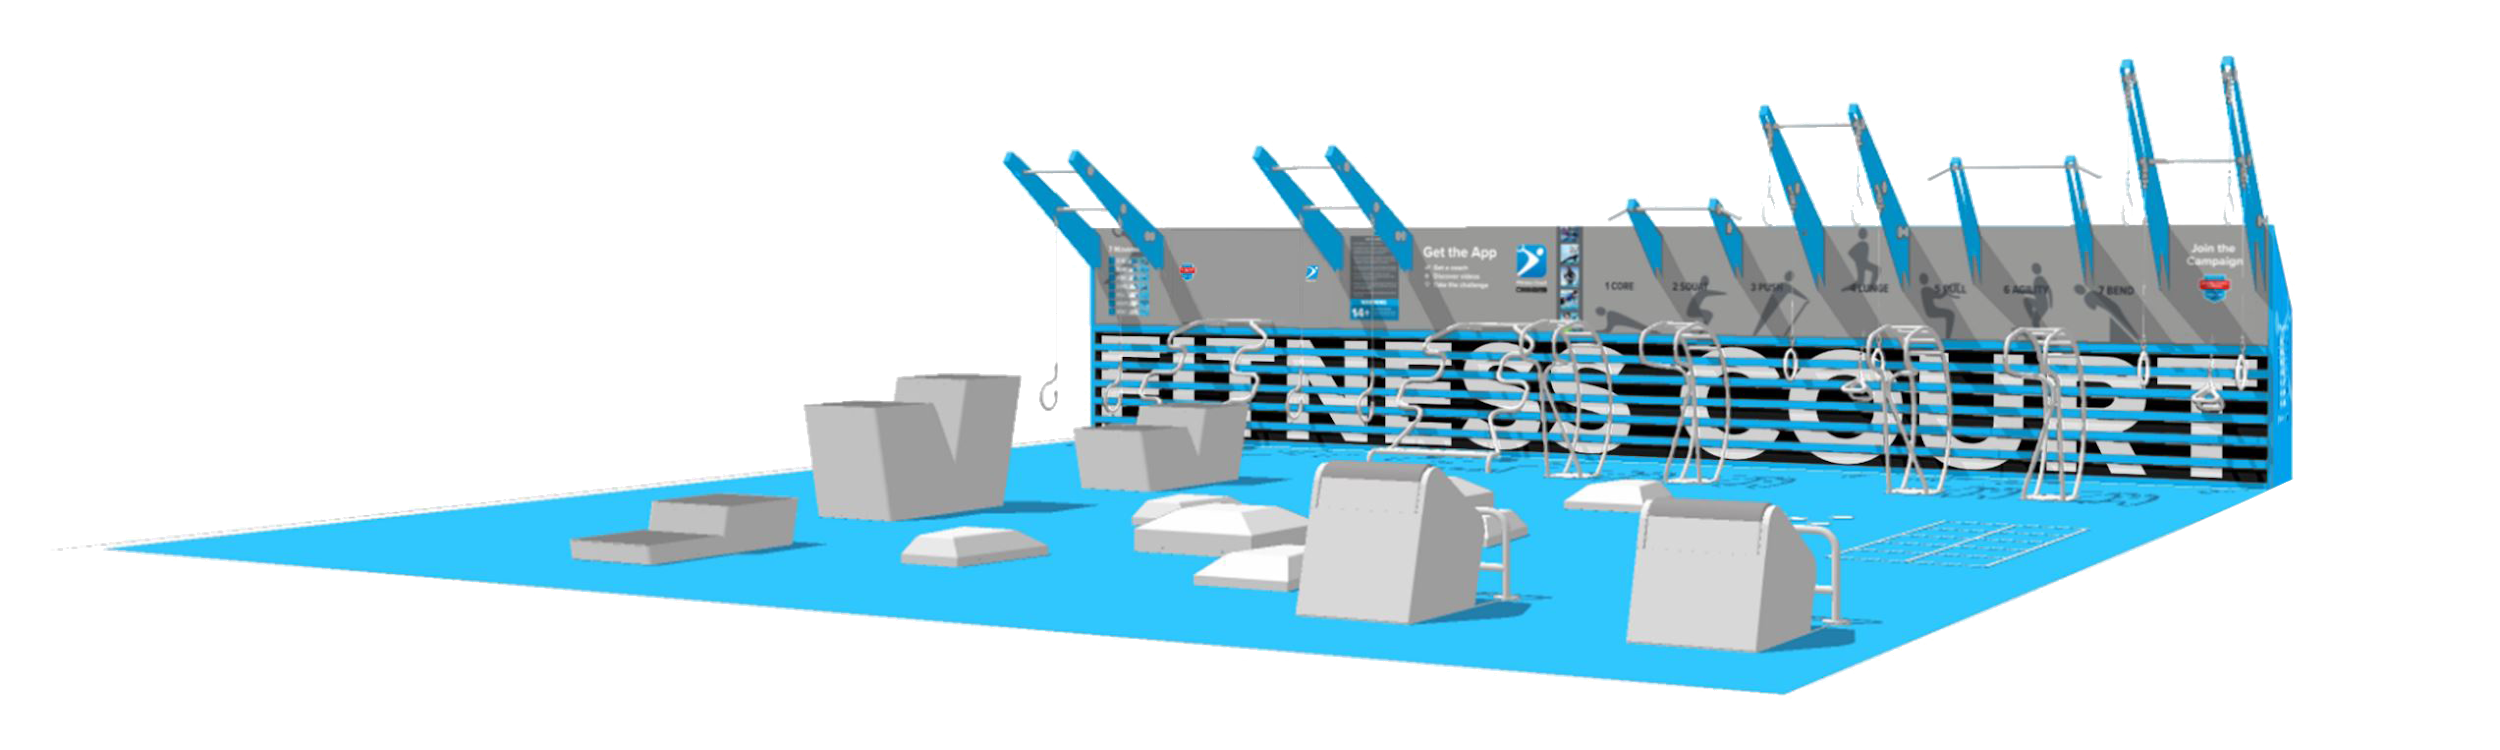 fitness court rendering